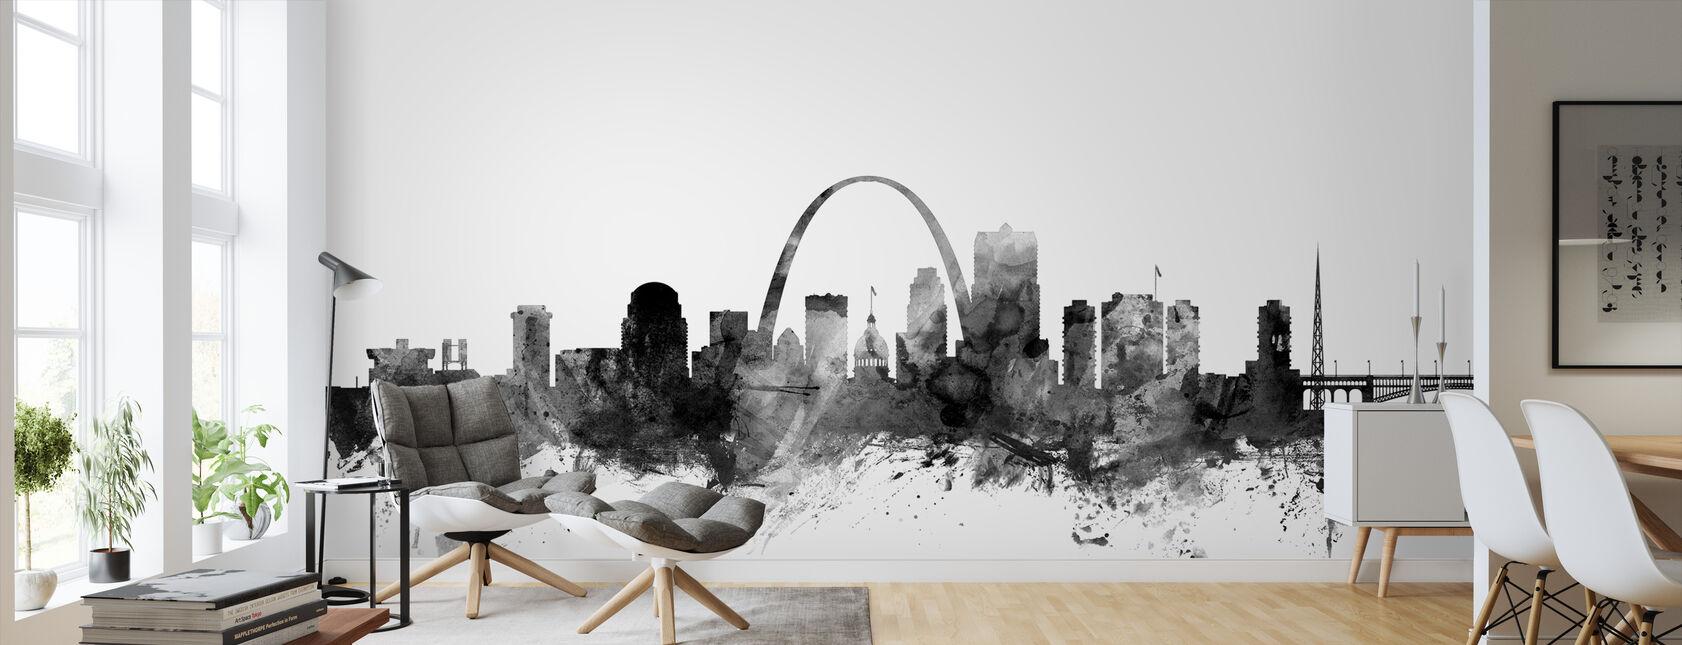 St Louis Missouri Skyline Black - Wallpaper - Living Room